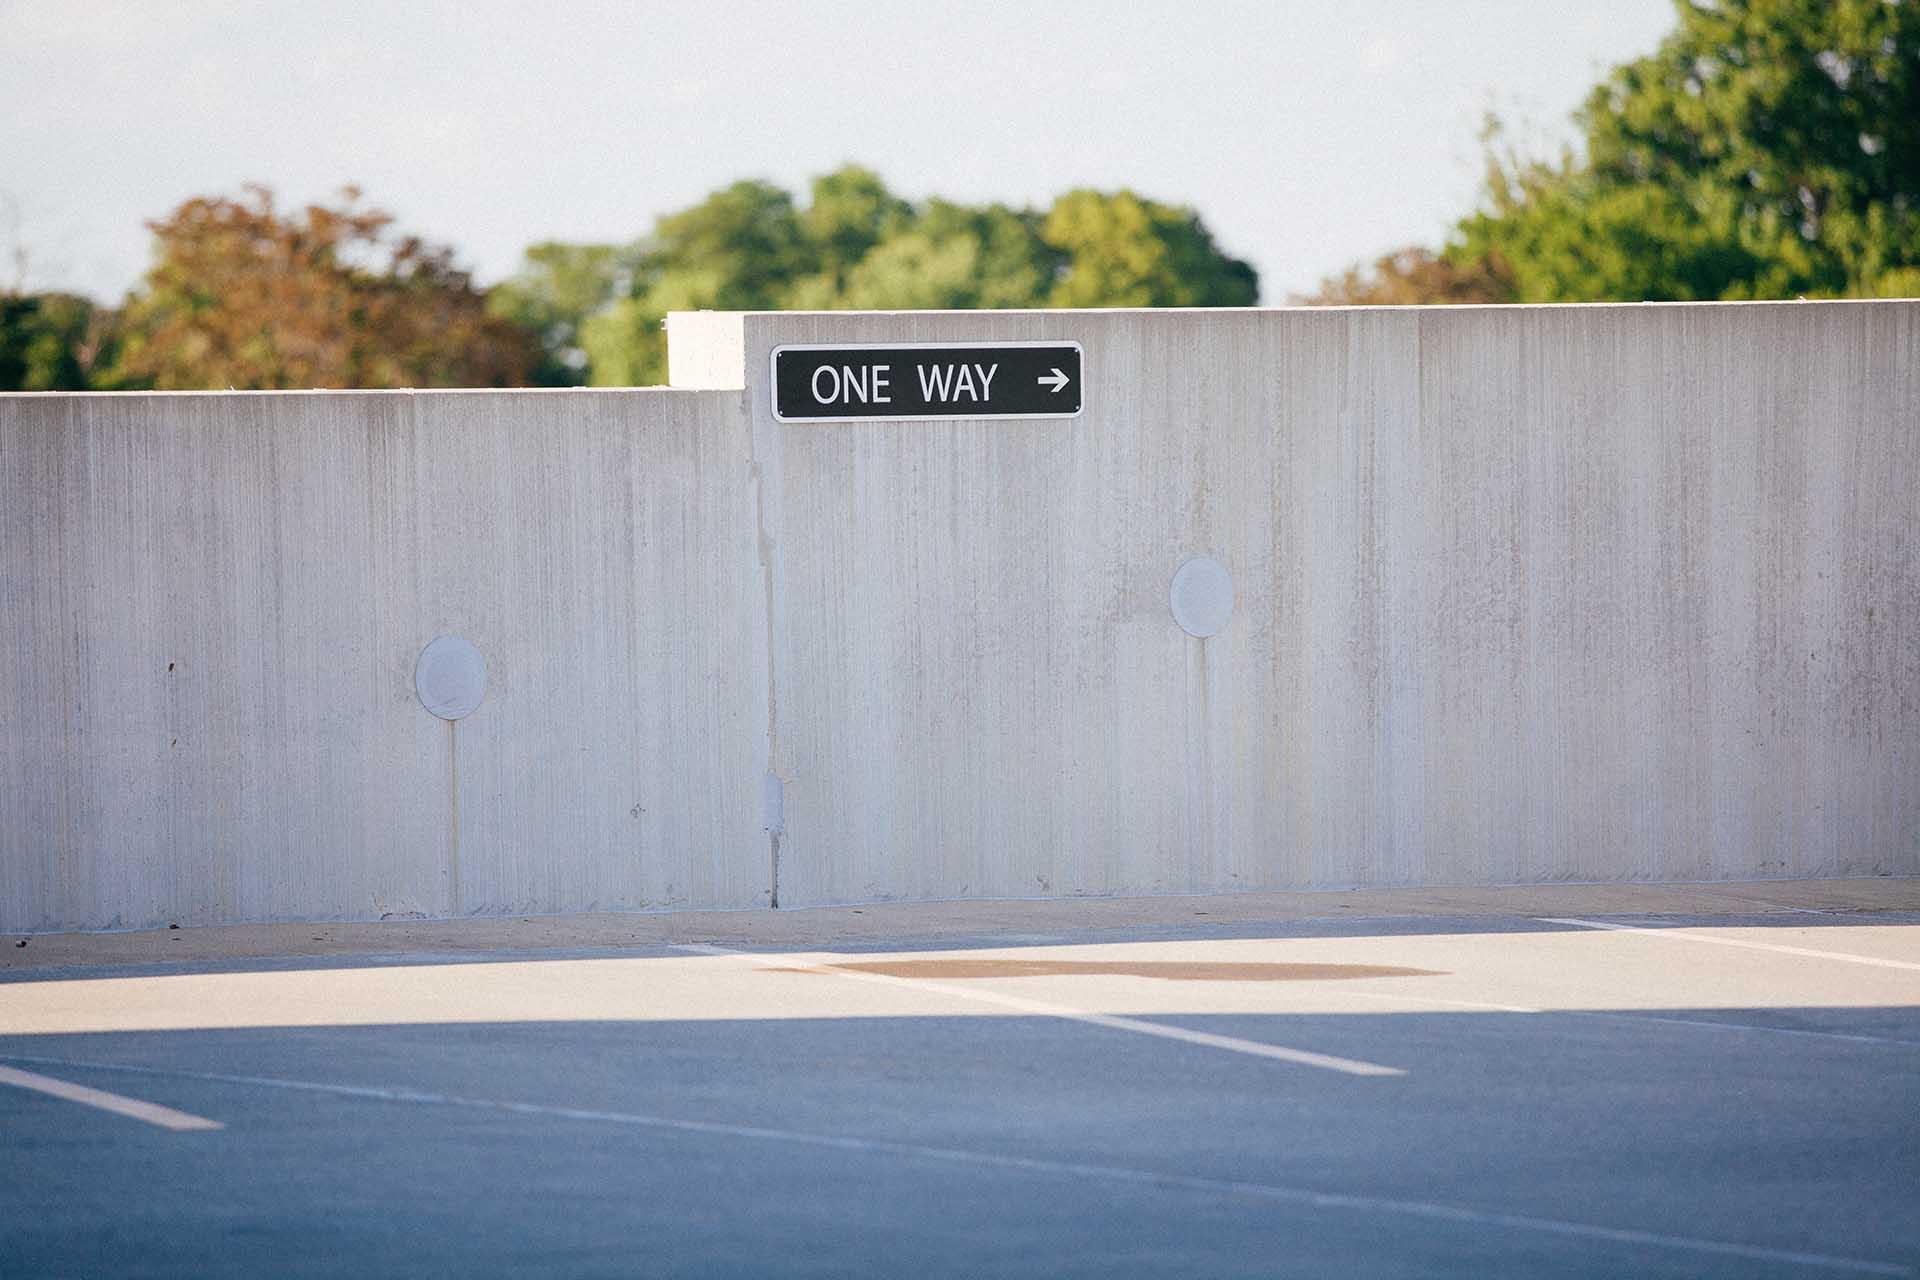 t2informatik Blog: Conway's one-way street